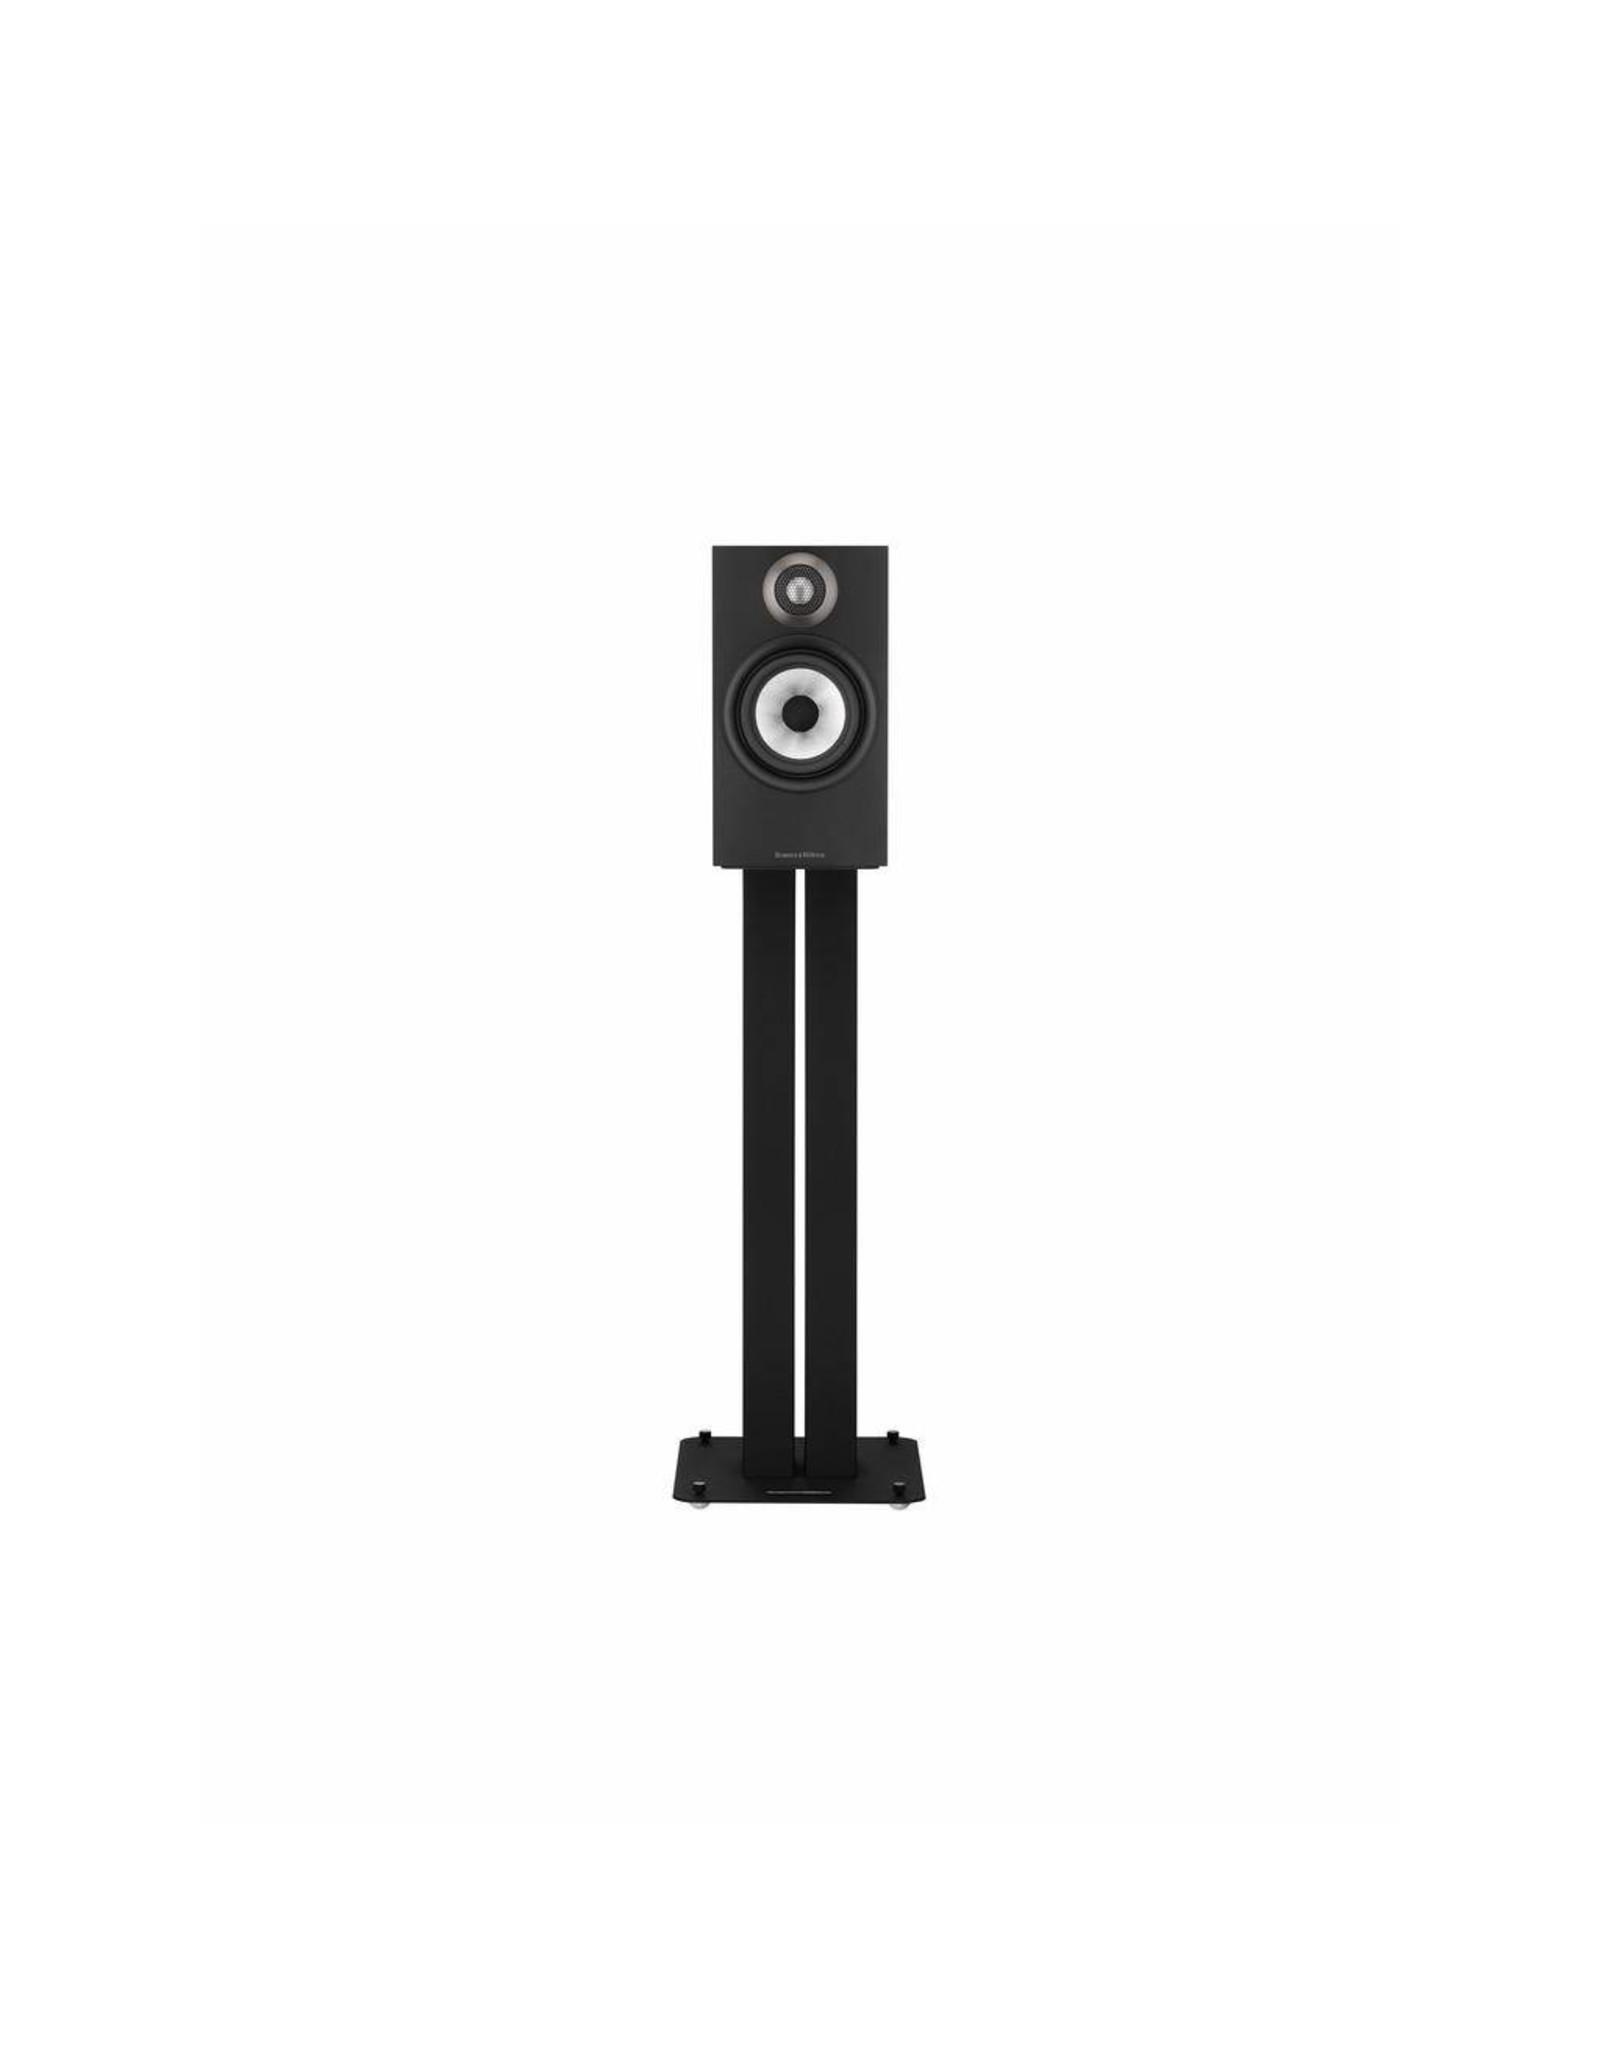 BOWERS & WILKINS B&W 607 Stand Mount Speakers (pair)